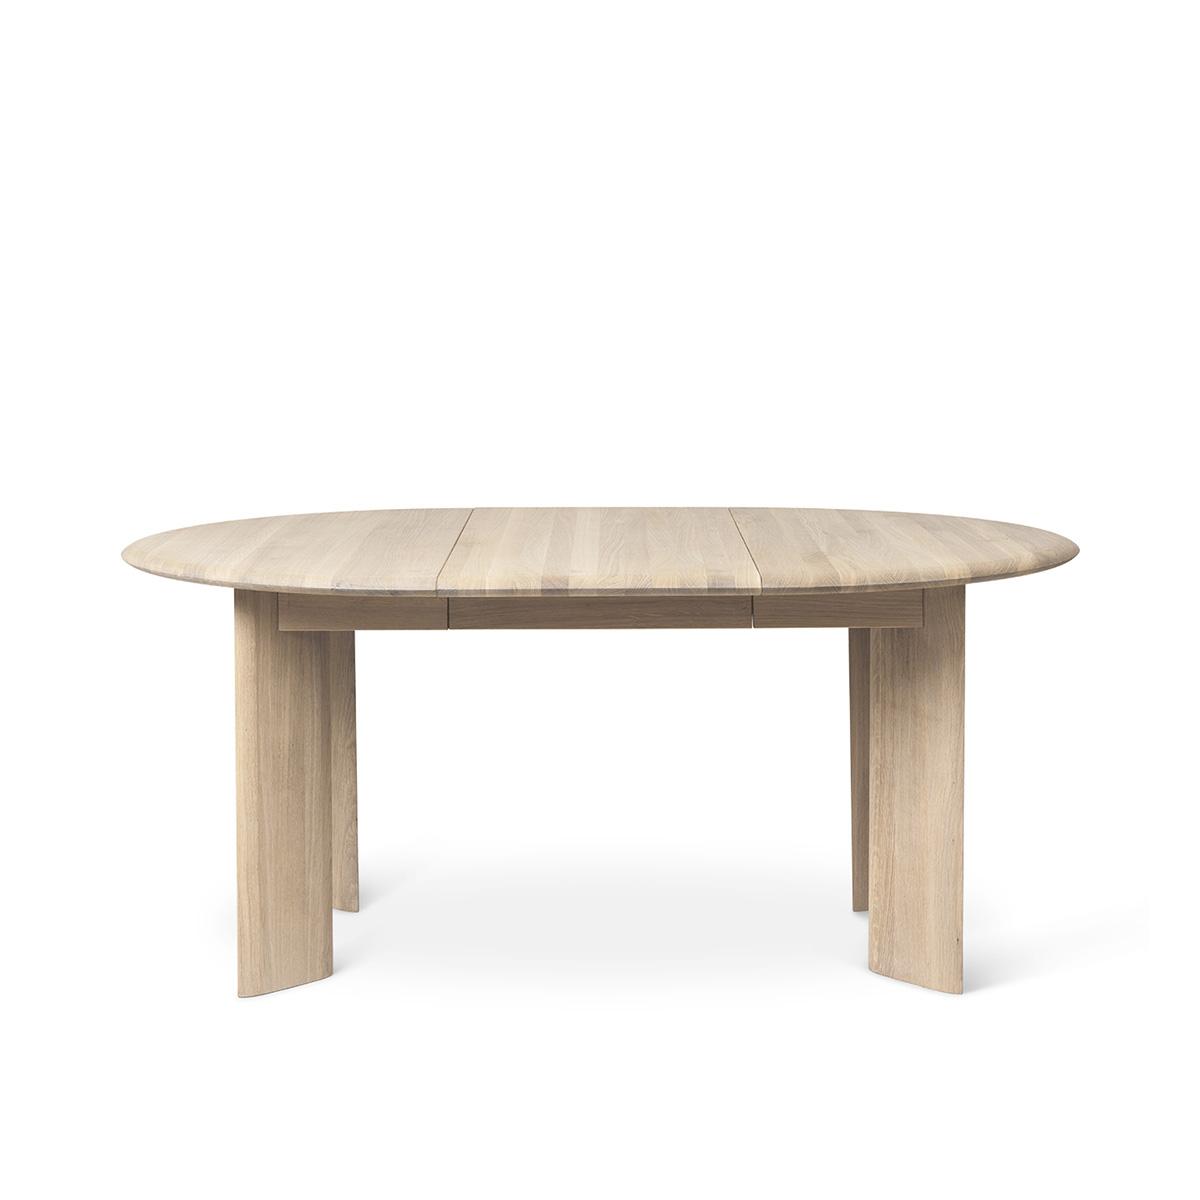 Spisebord Bevel Ø167 Hvit Oljet Eik